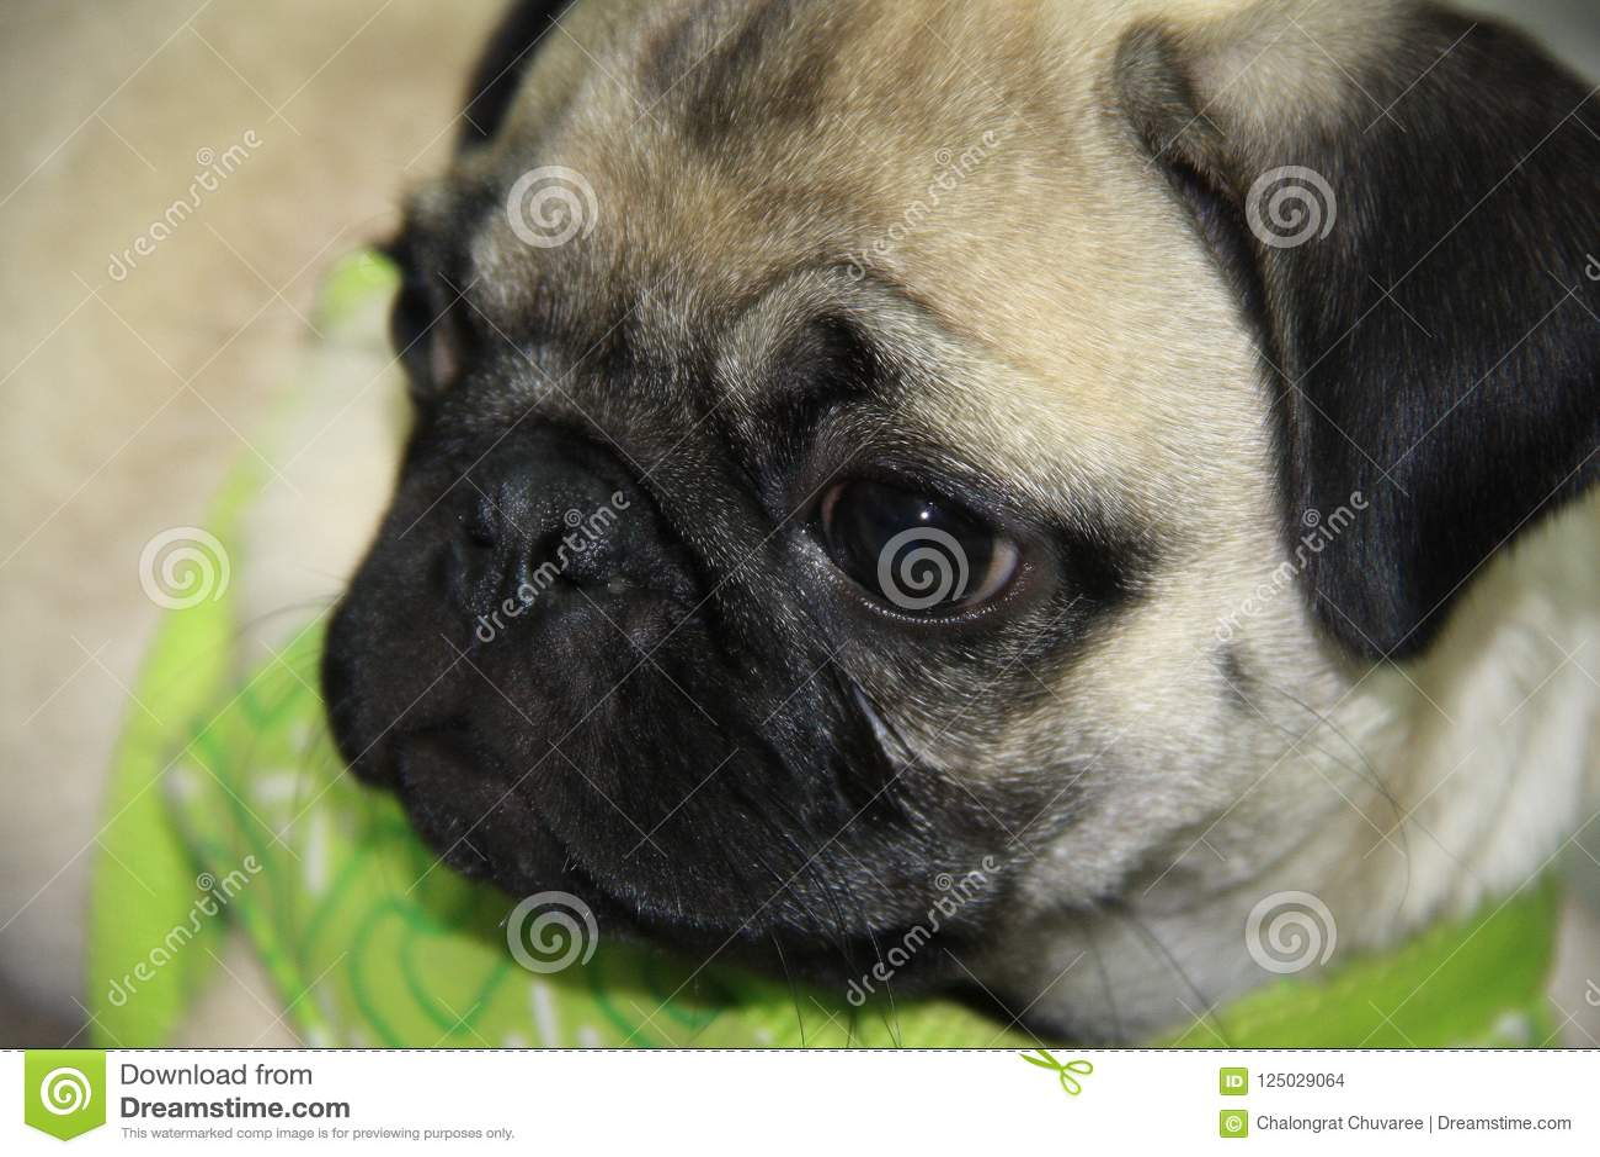 Baby Pug Puppy Stock Photo Image Of Purebred Black 125029064